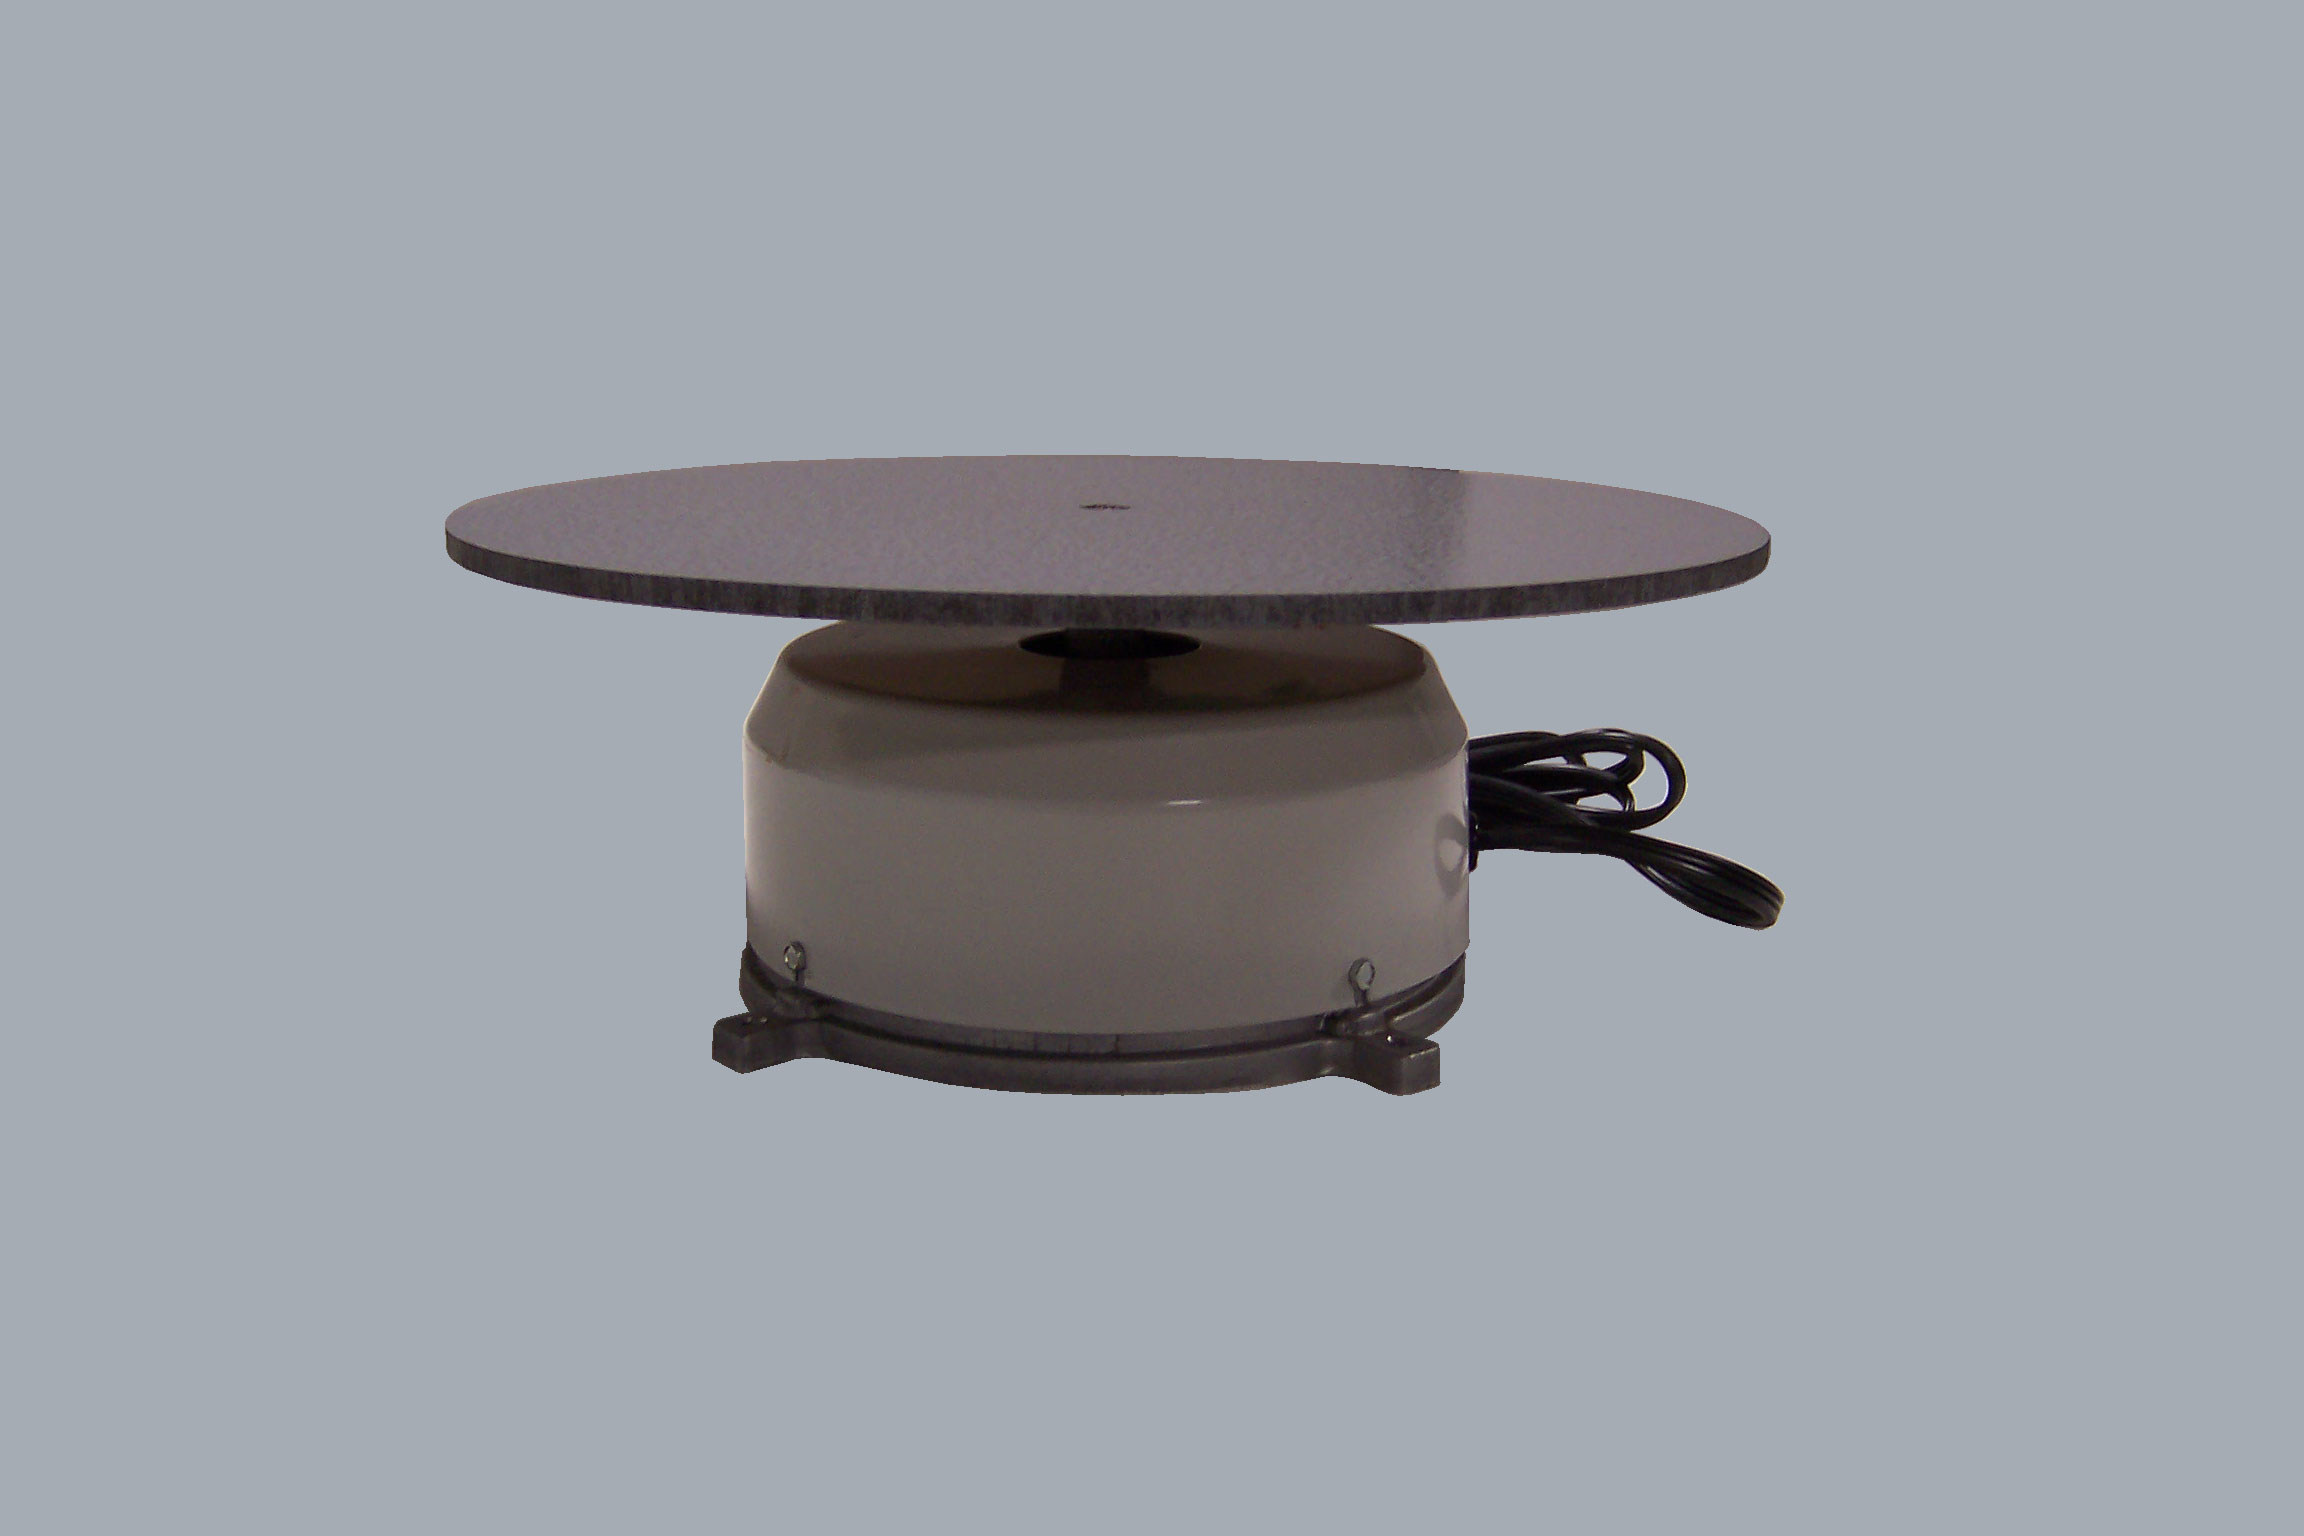 Auto Reverse Tabletop Turntable 120/12